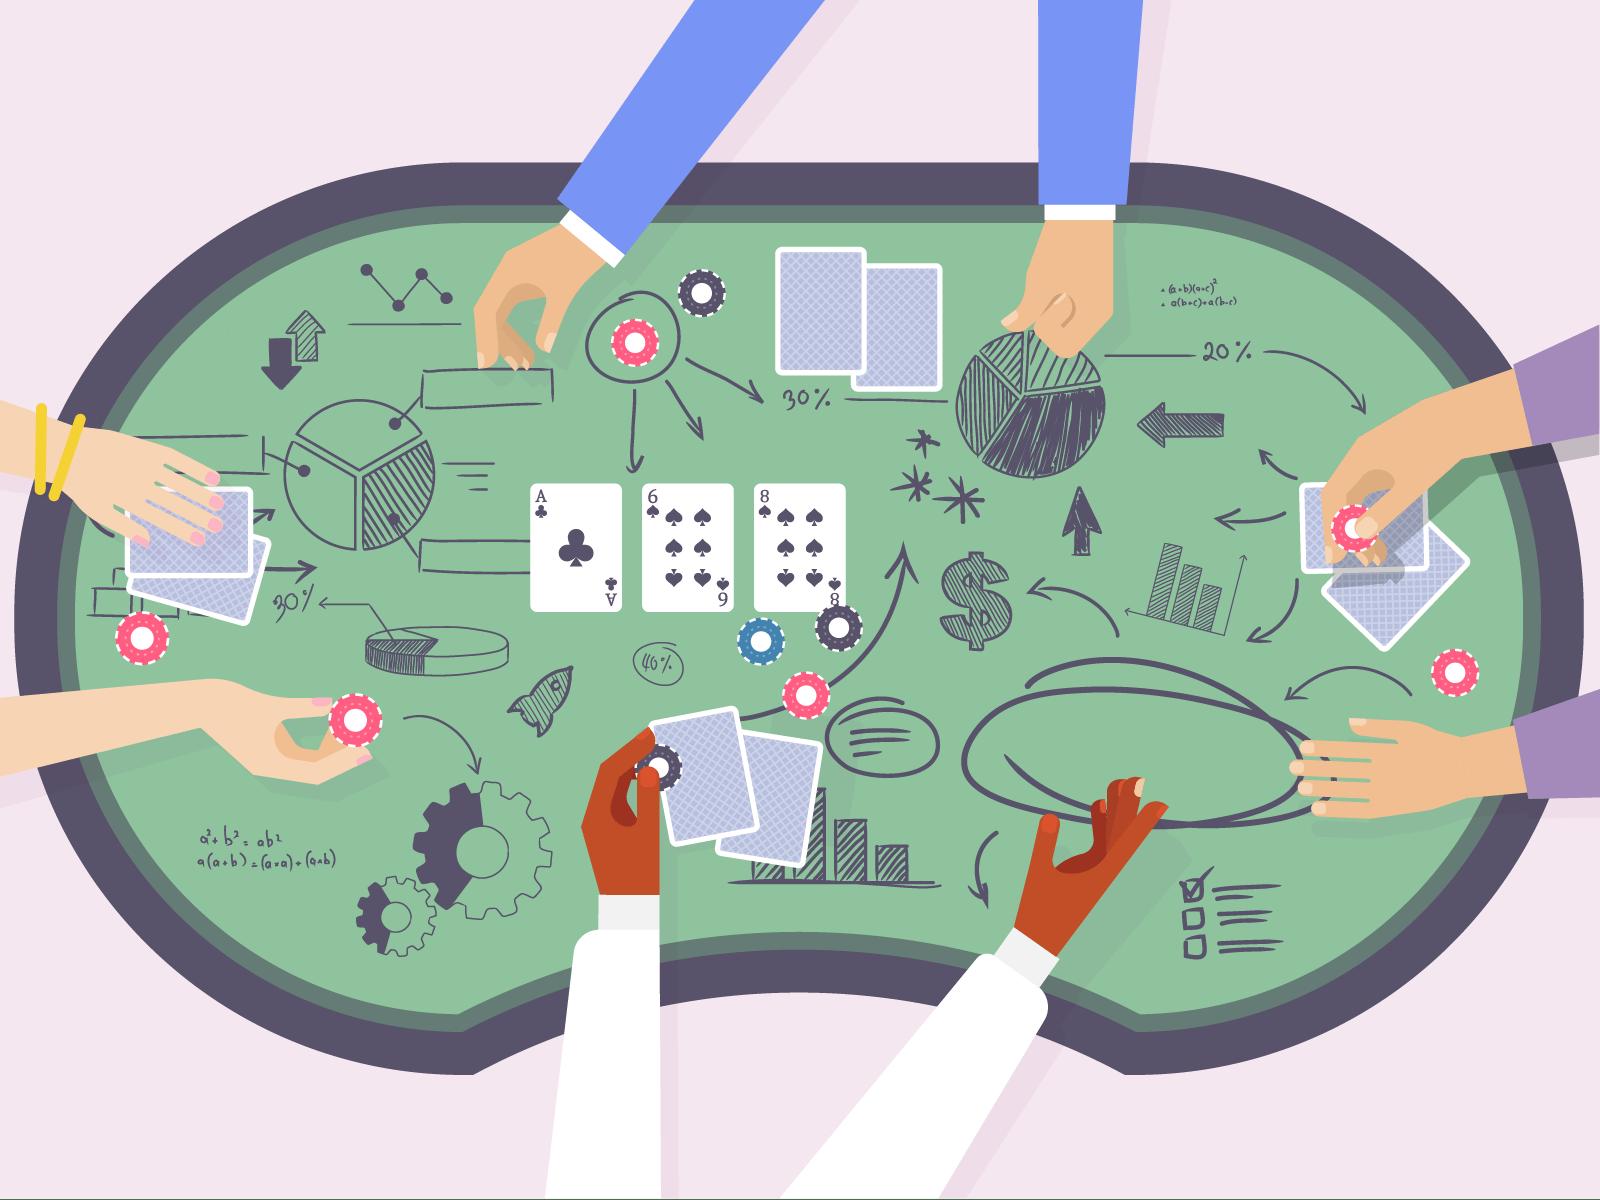 Meja poker dengan simbol matematika digambar di atasnya